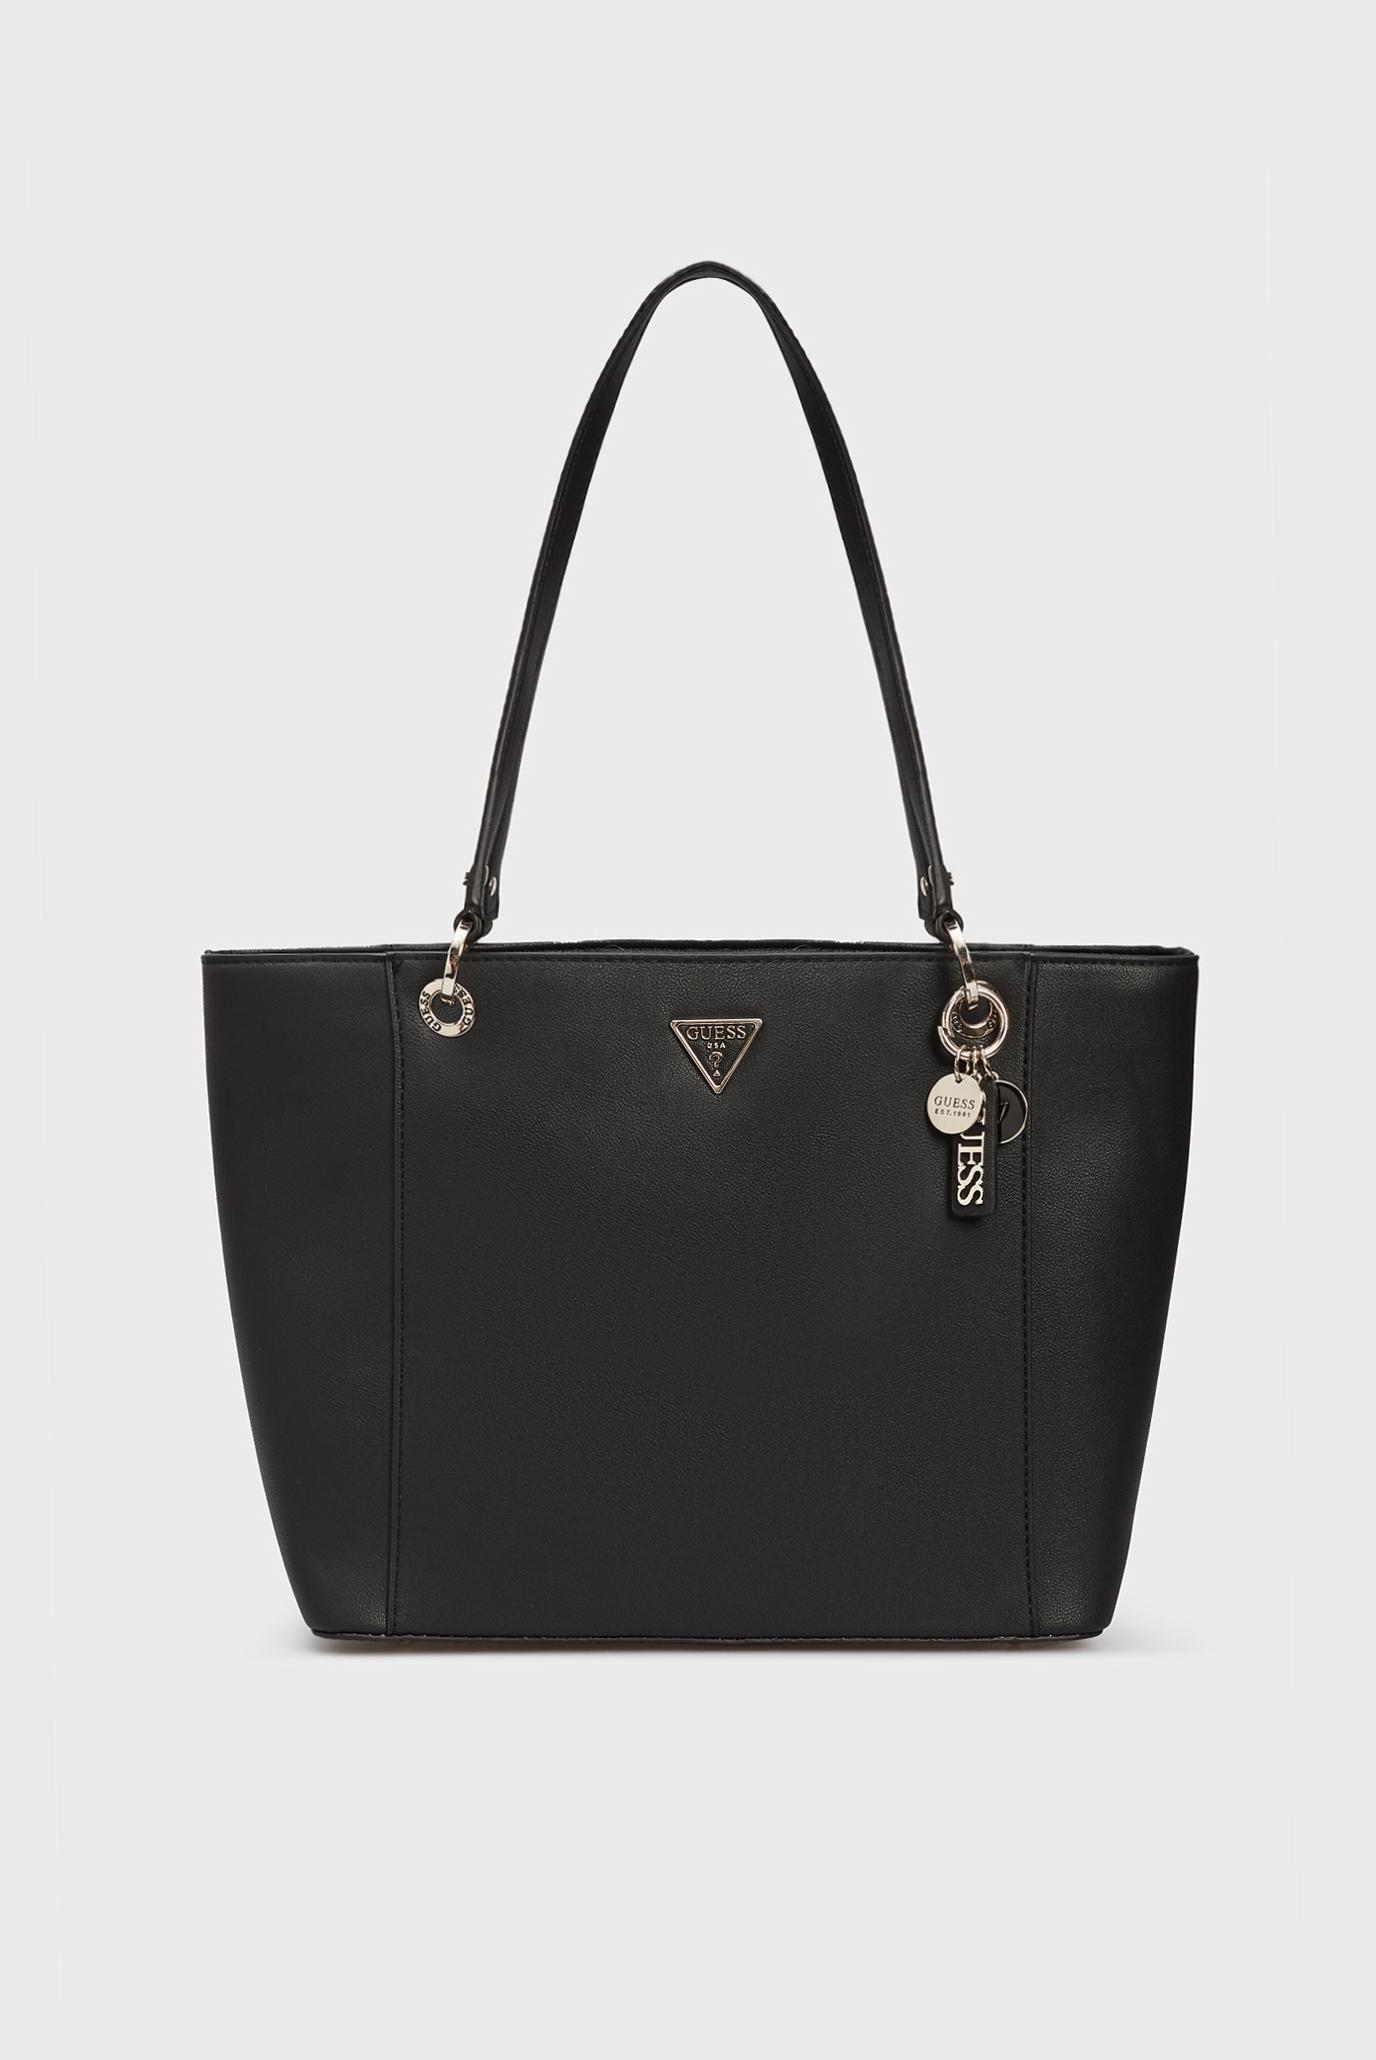 Жіноча чорна сумка NOELLE ELITE TOTE 1